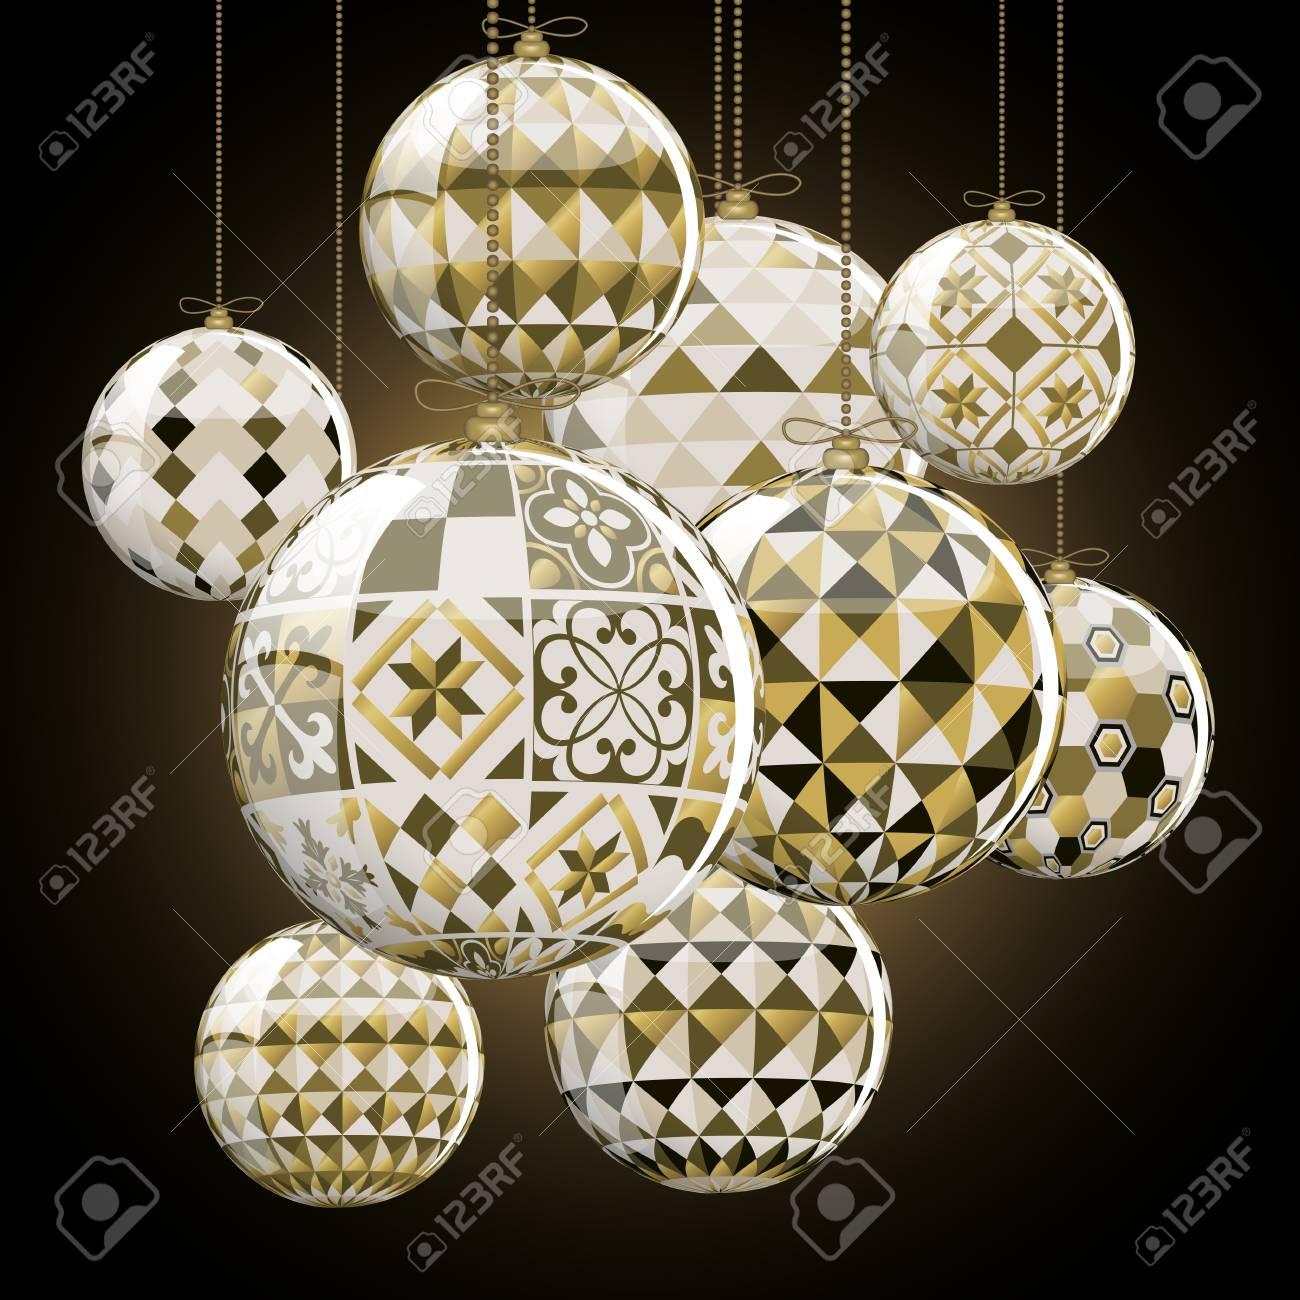 Geometric christmas balls full vector greeting card royalty free geometric christmas balls full vector greeting card stock vector 60198825 aloadofball Images